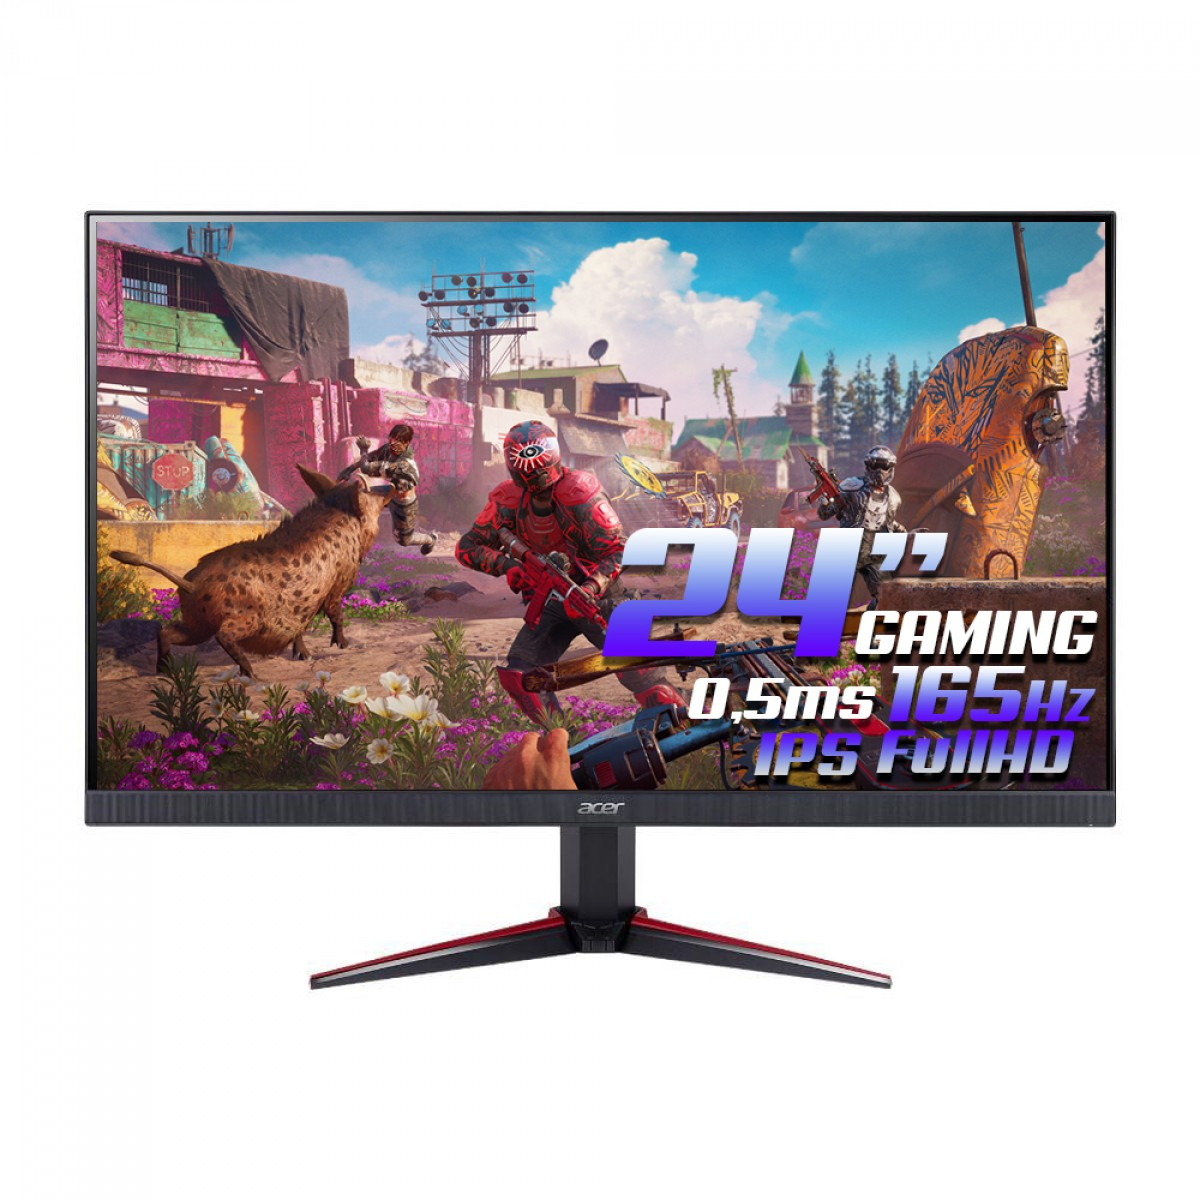 Monitor Gamer Acer Nitro, 24 Pol, FullHD, 165Hz, DP/HDMI, VG240Y